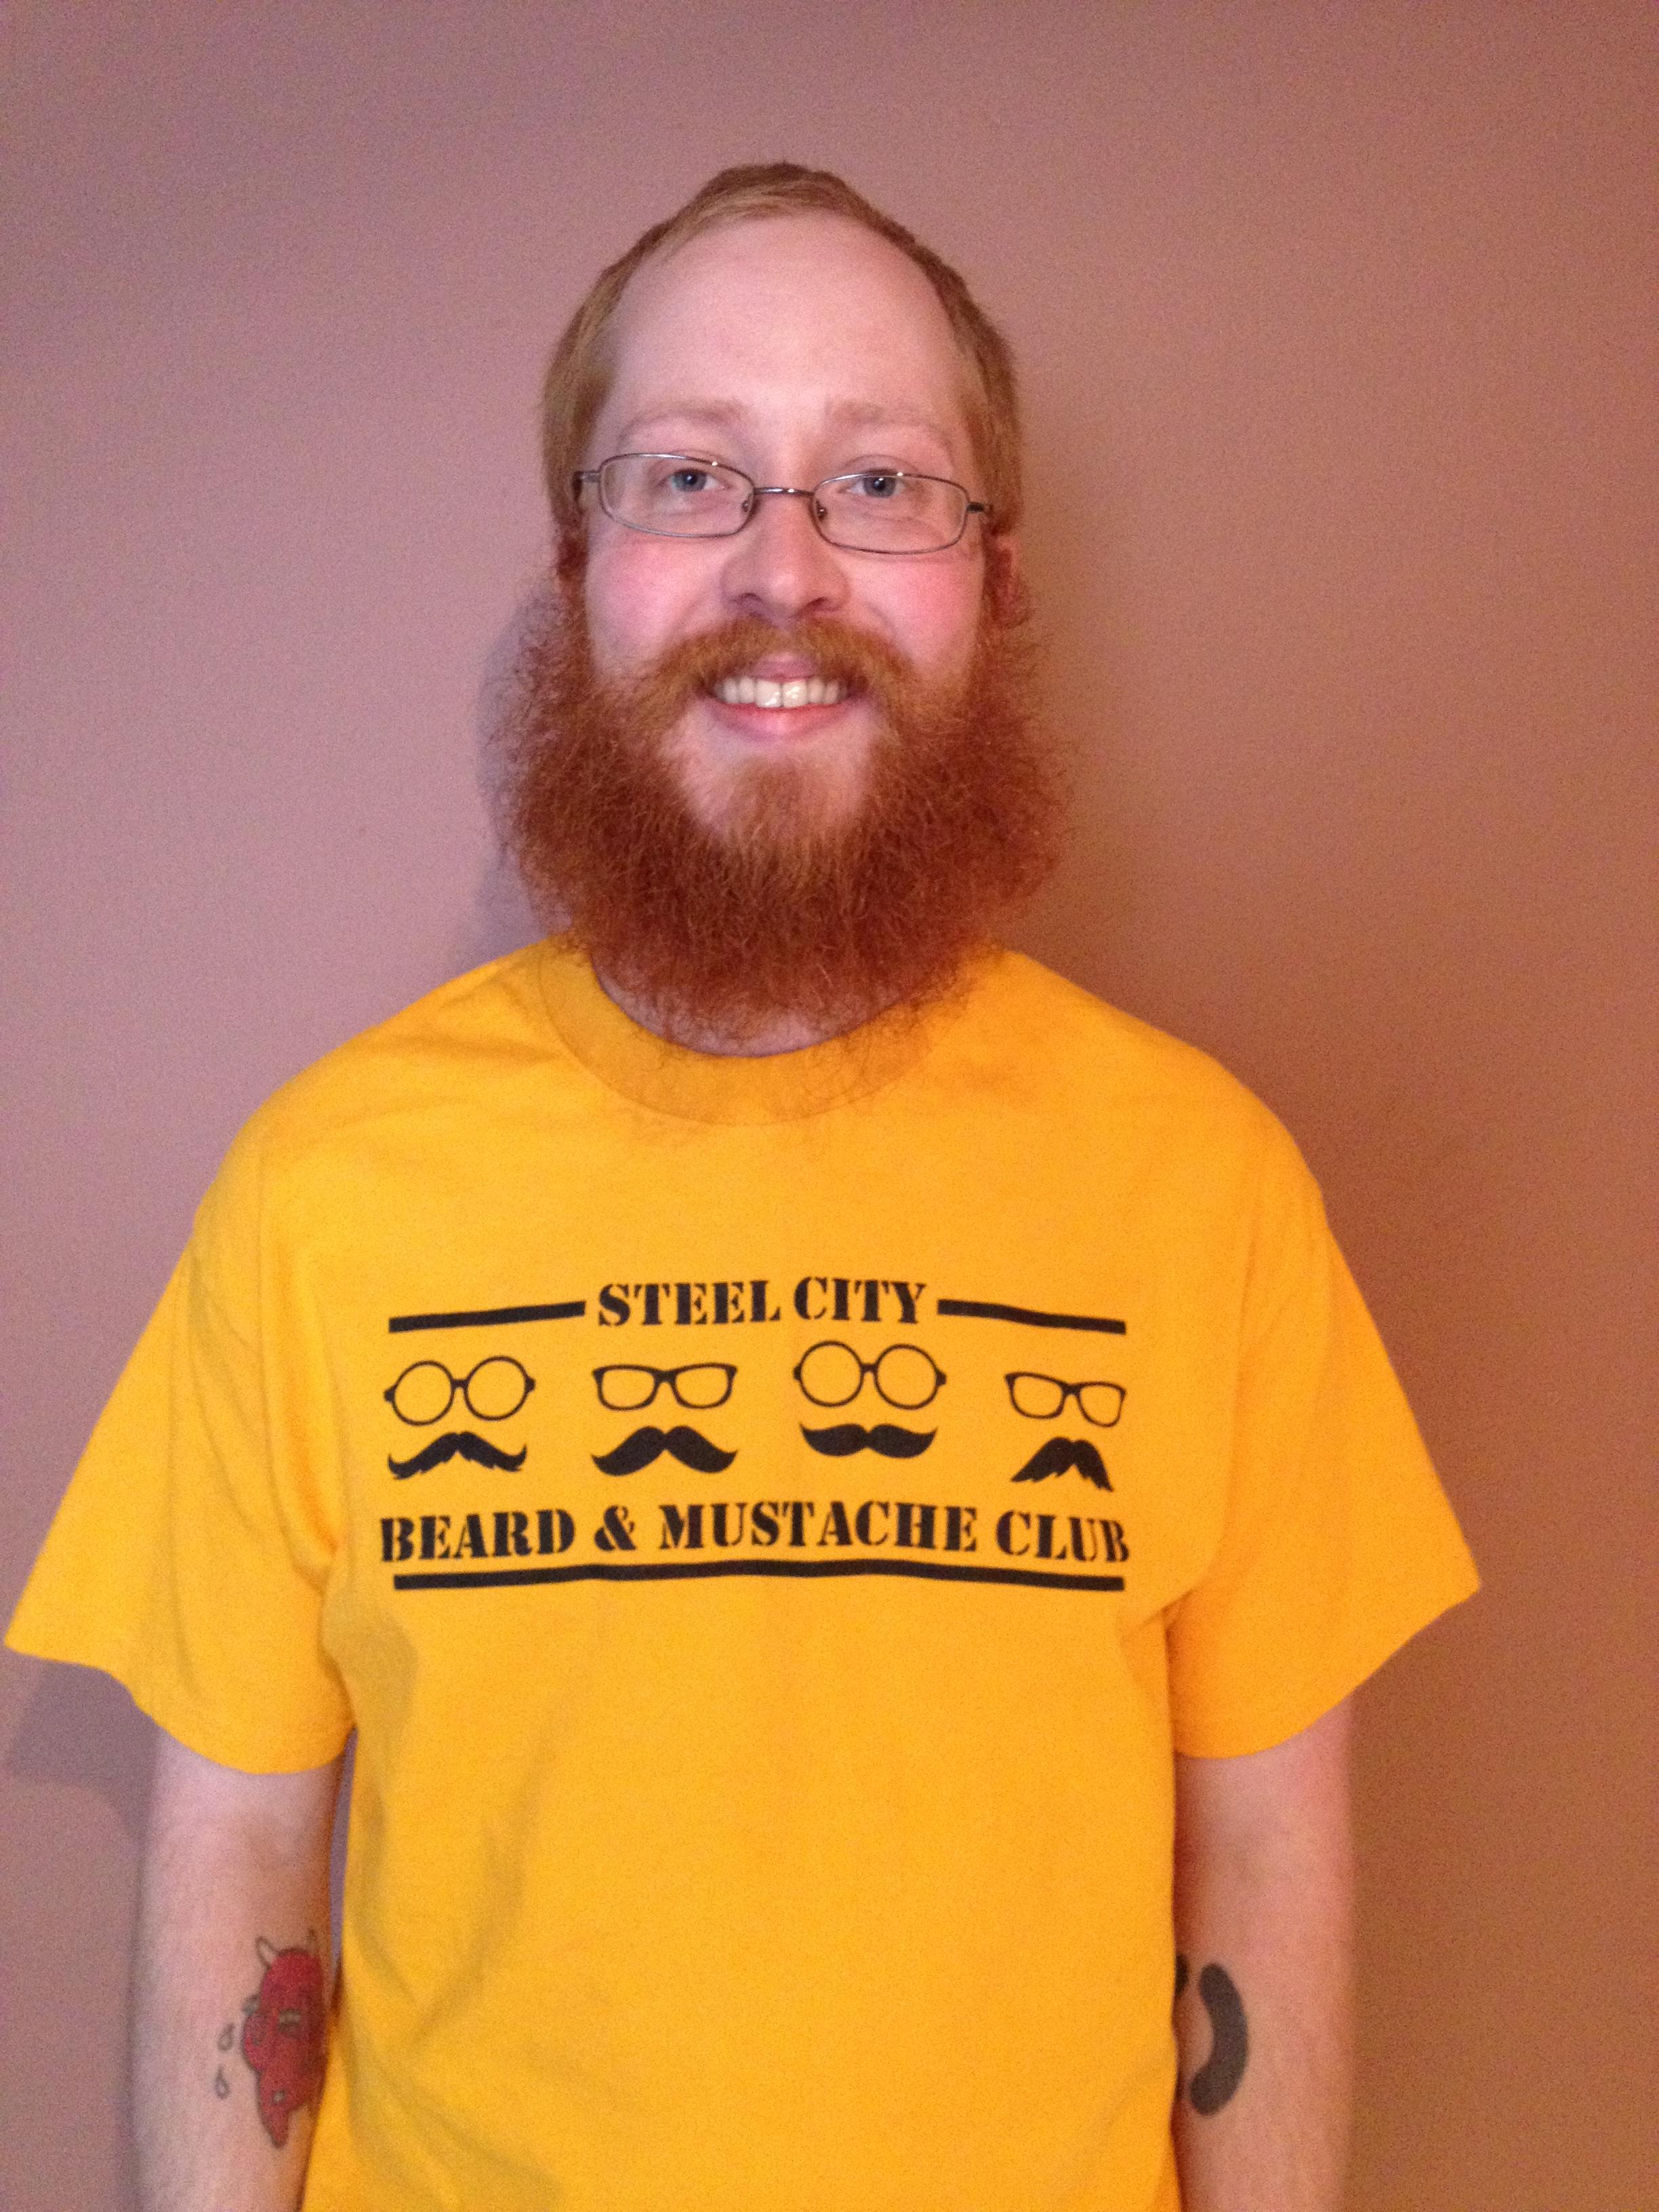 The champion displays his impressive winning beard and mustache.